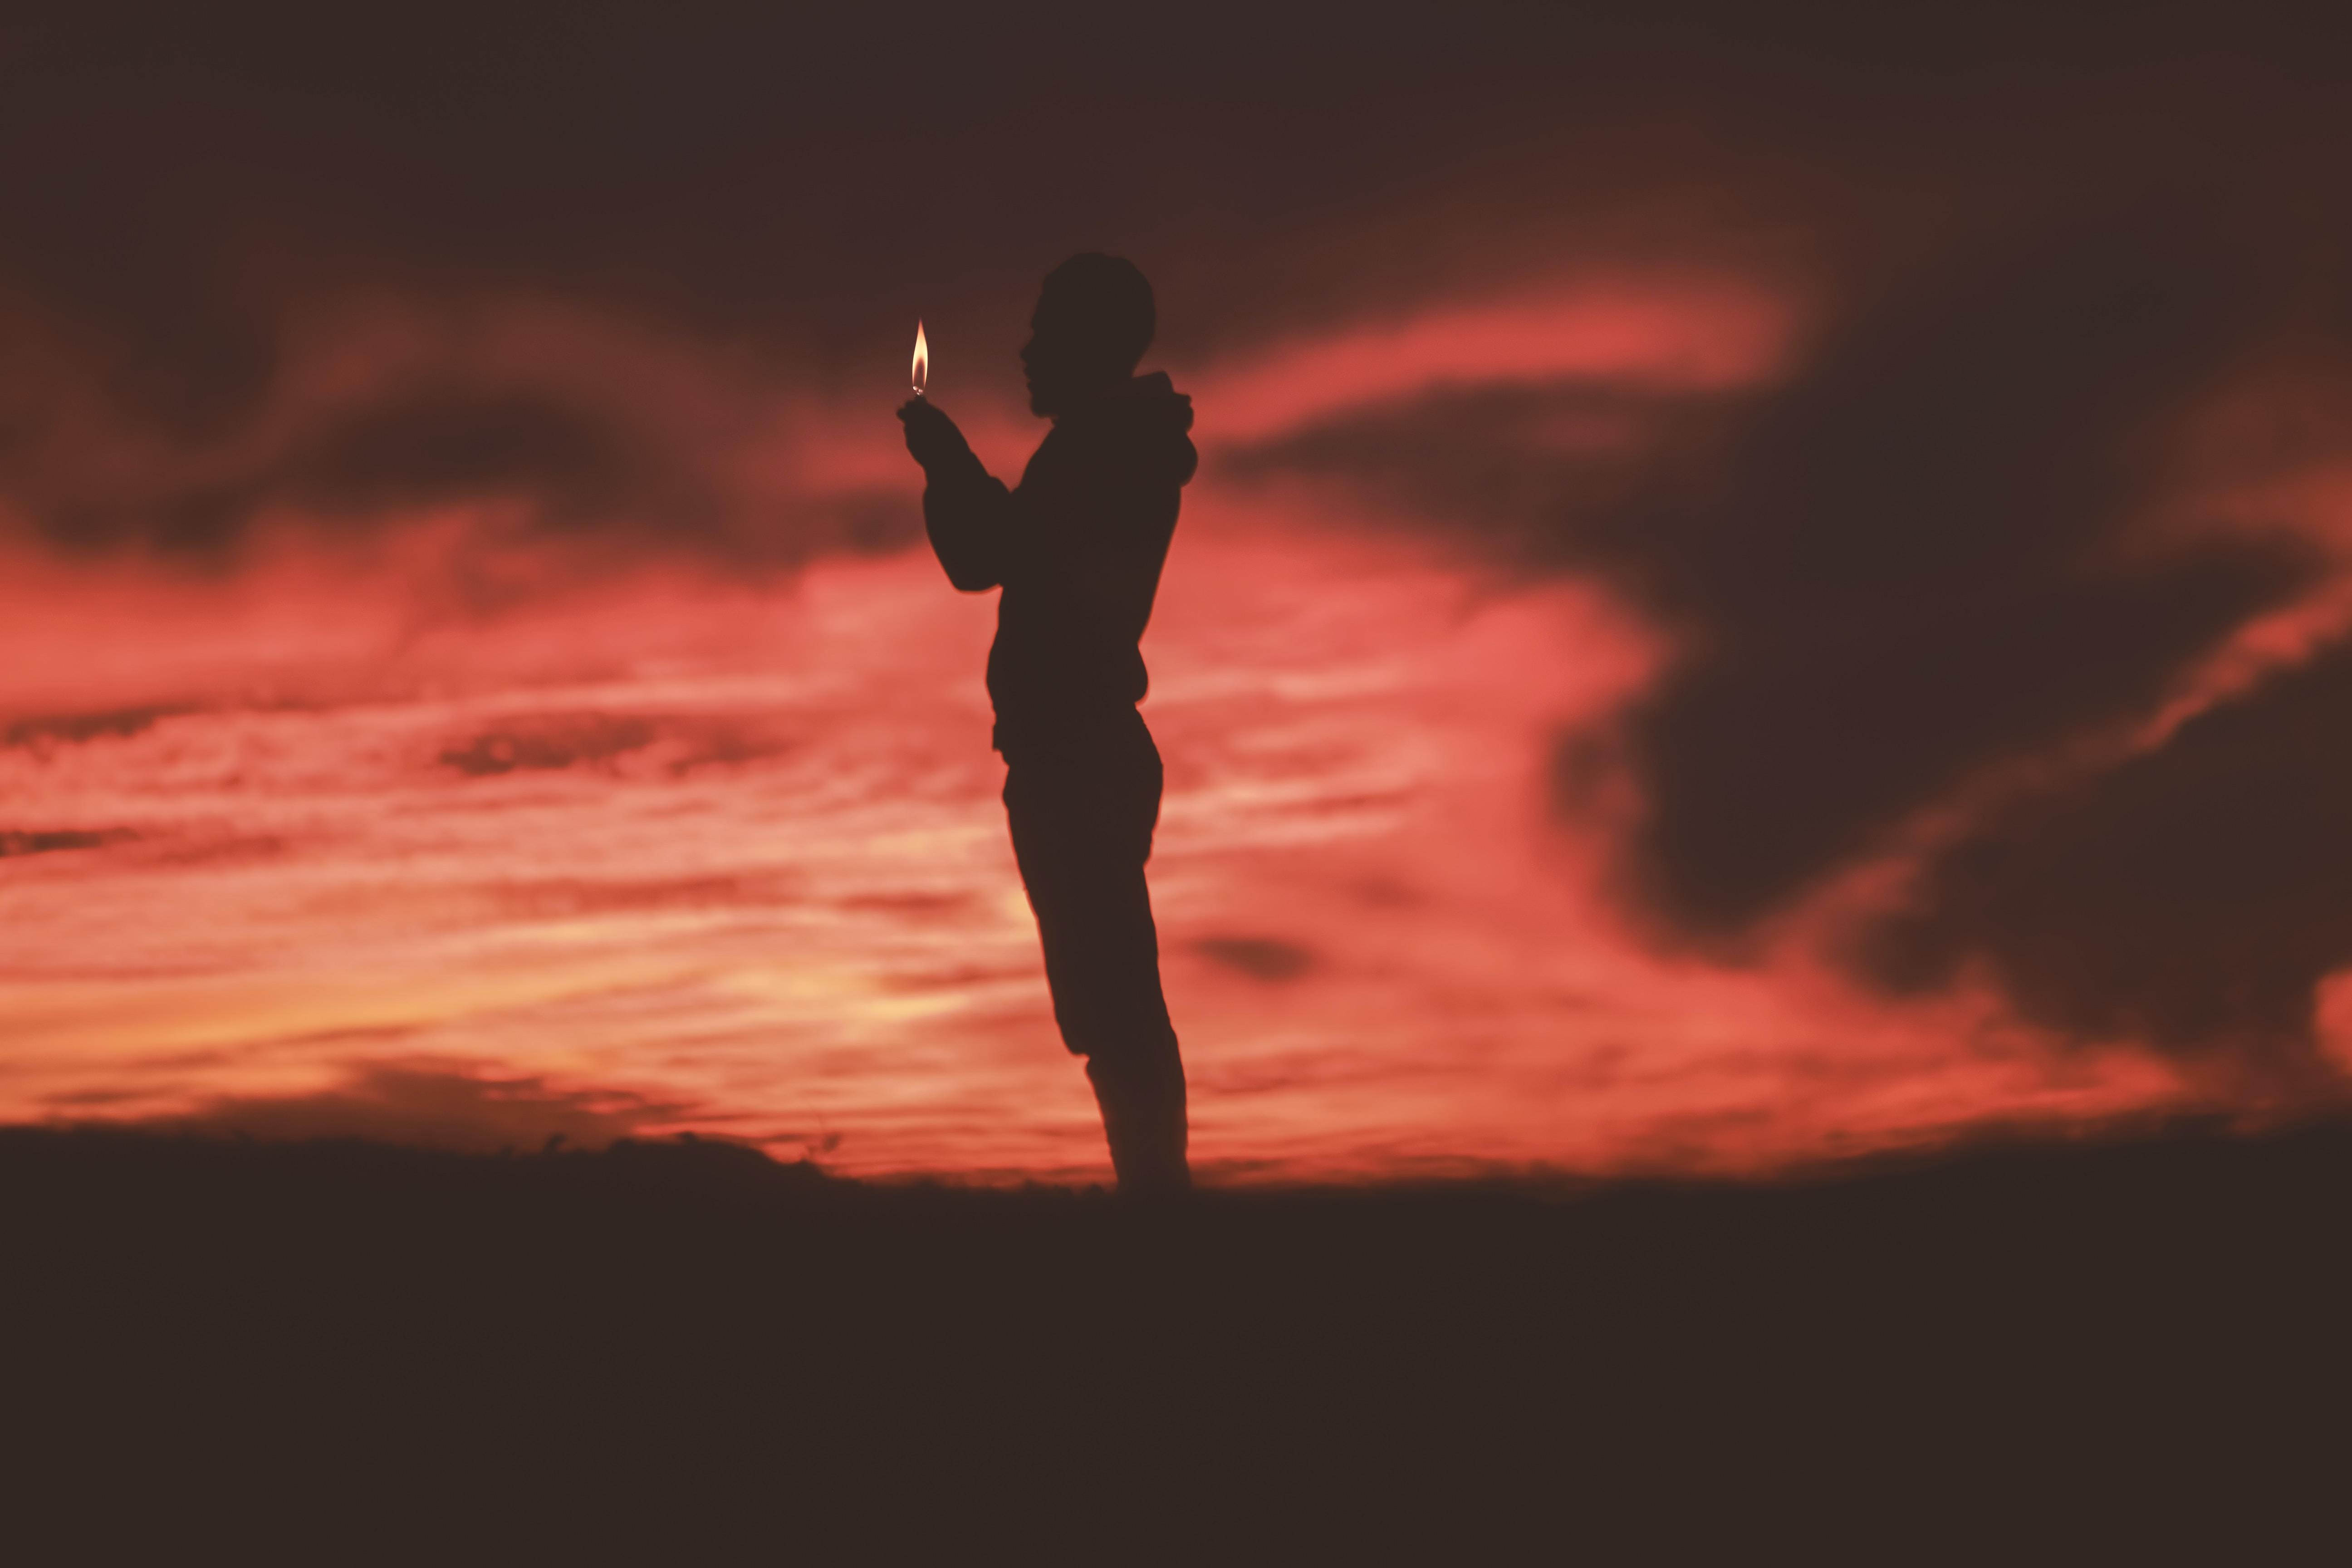 silhouette of man holding lighter